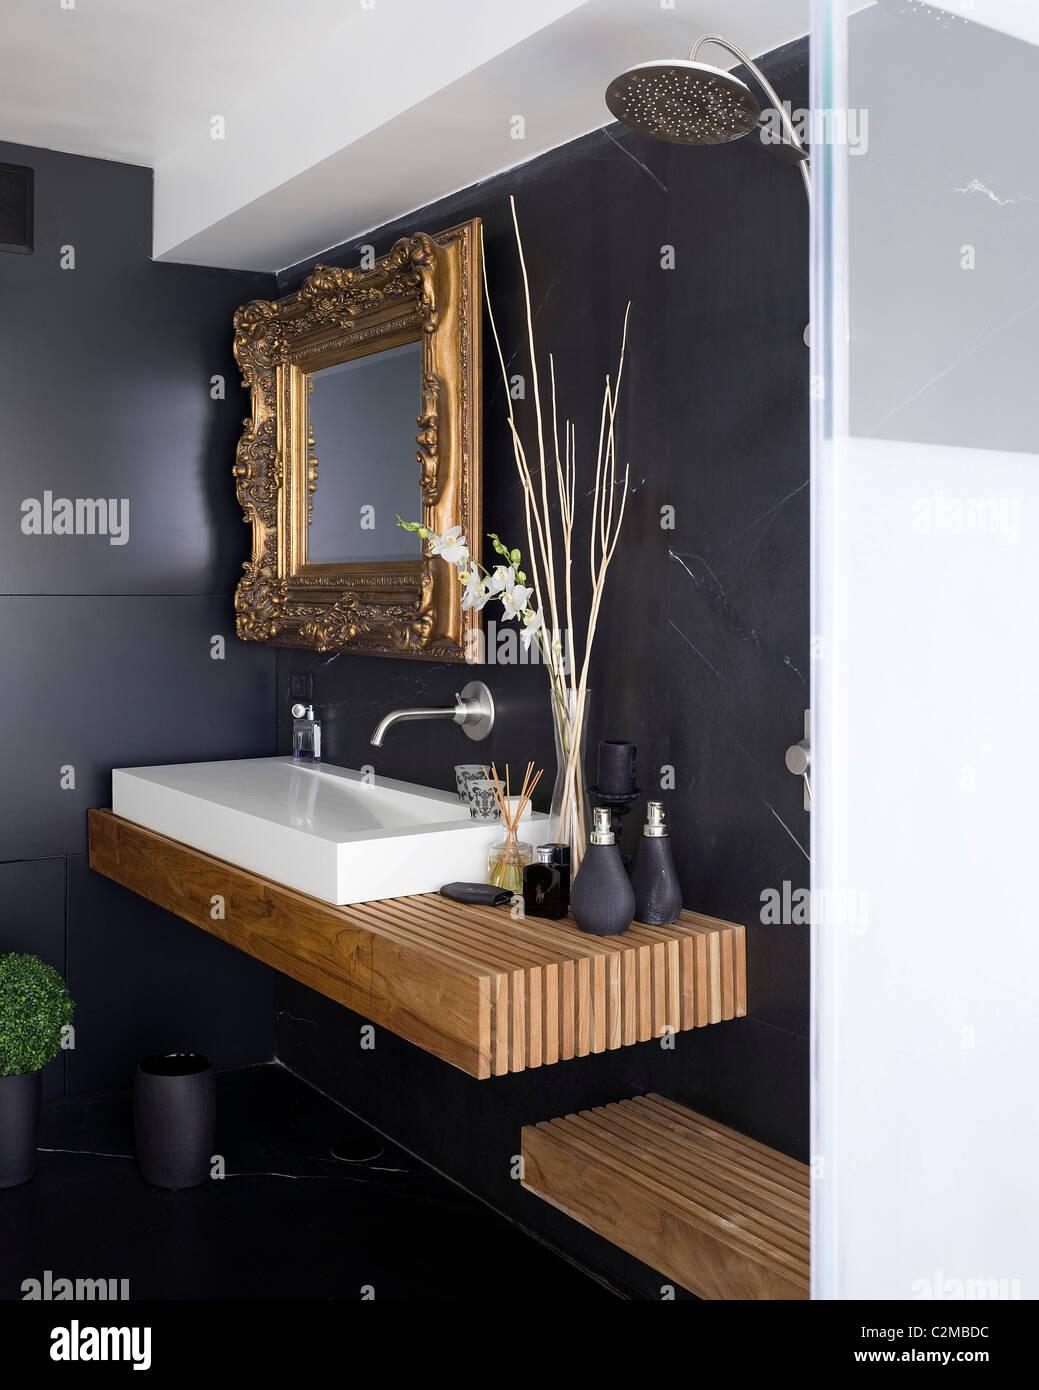 Oren Residence Modern Bathroom With Ornate Gold Framed Mirror Stock Photo Alamy